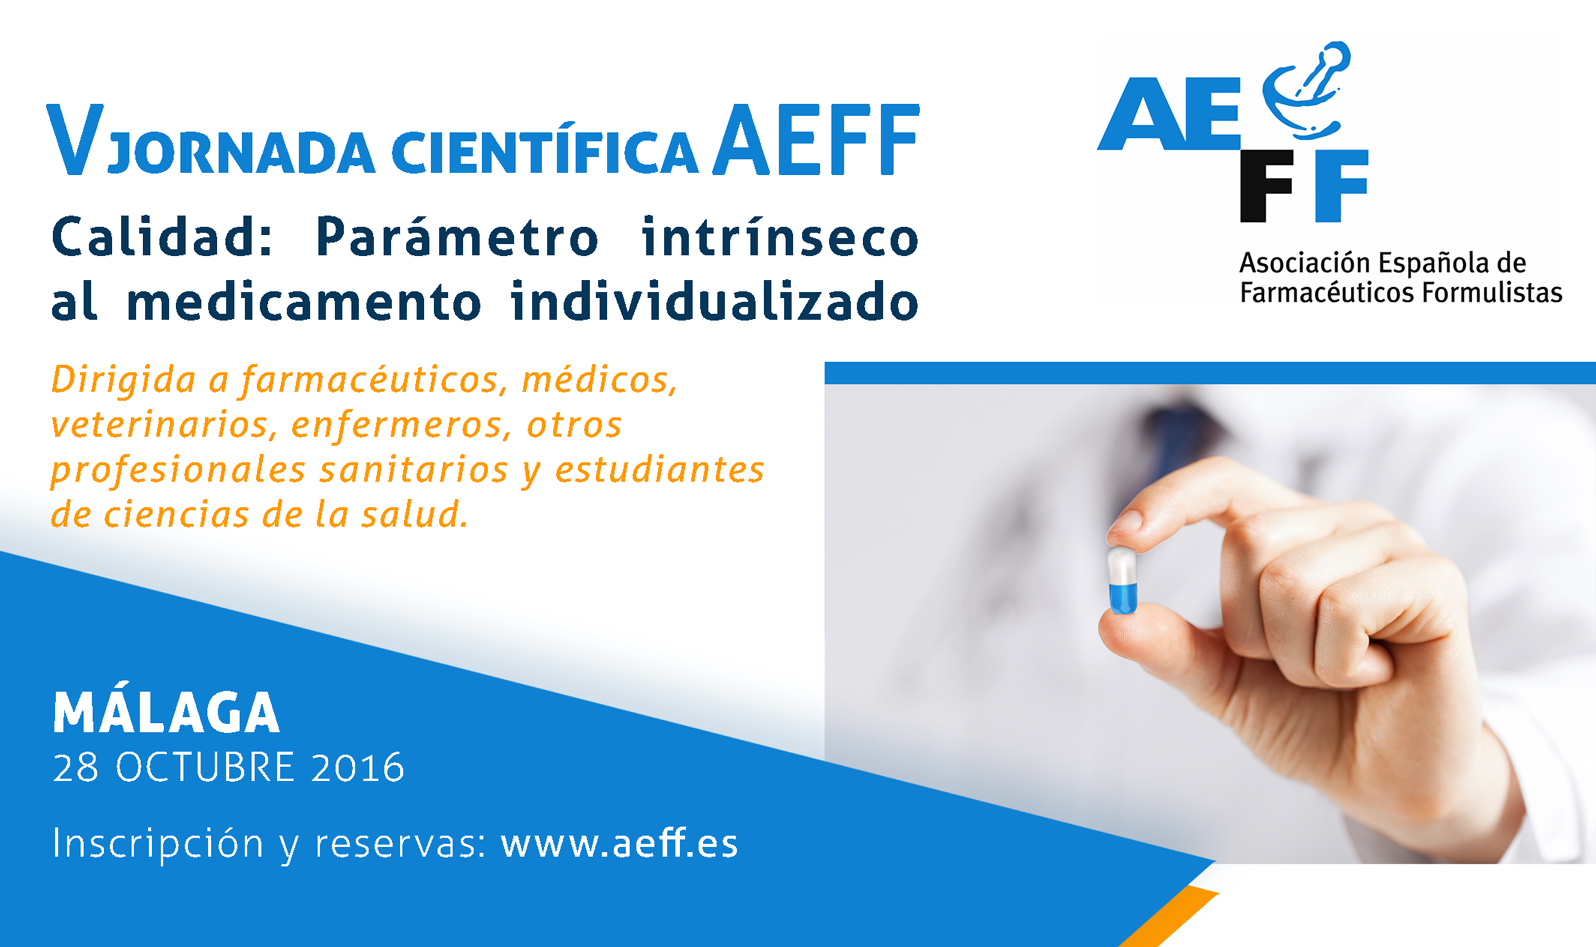 jornada científica AEFF farmaquimicasur